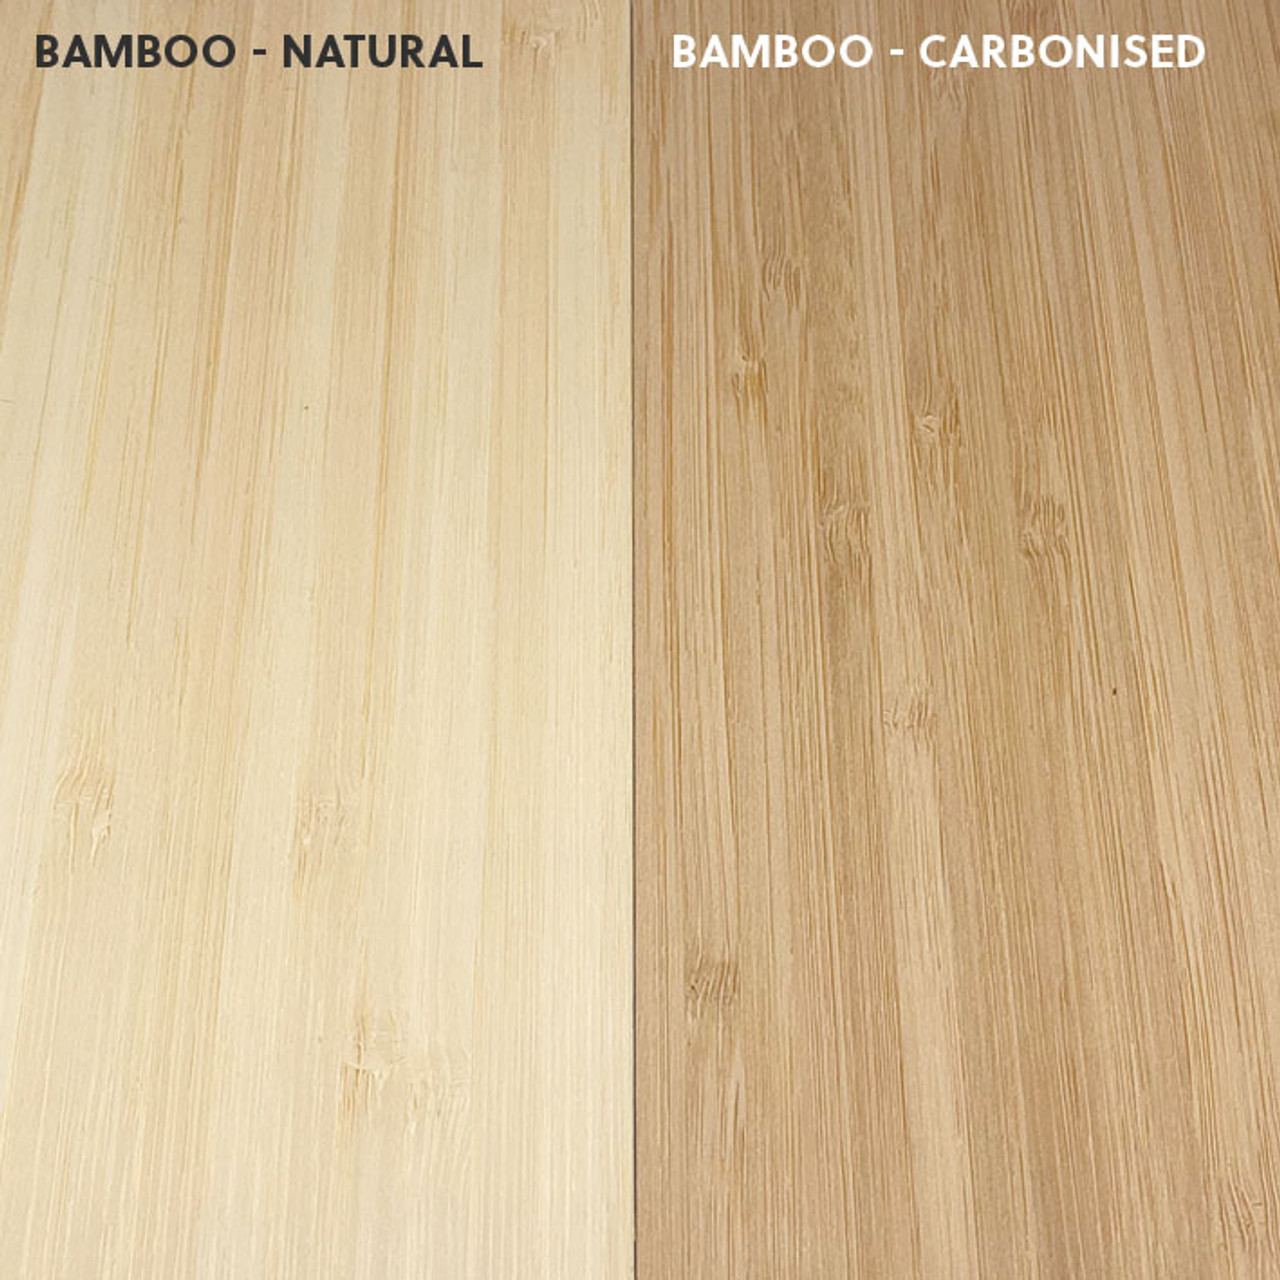 Natural bamboo vs. carbonised bamboo